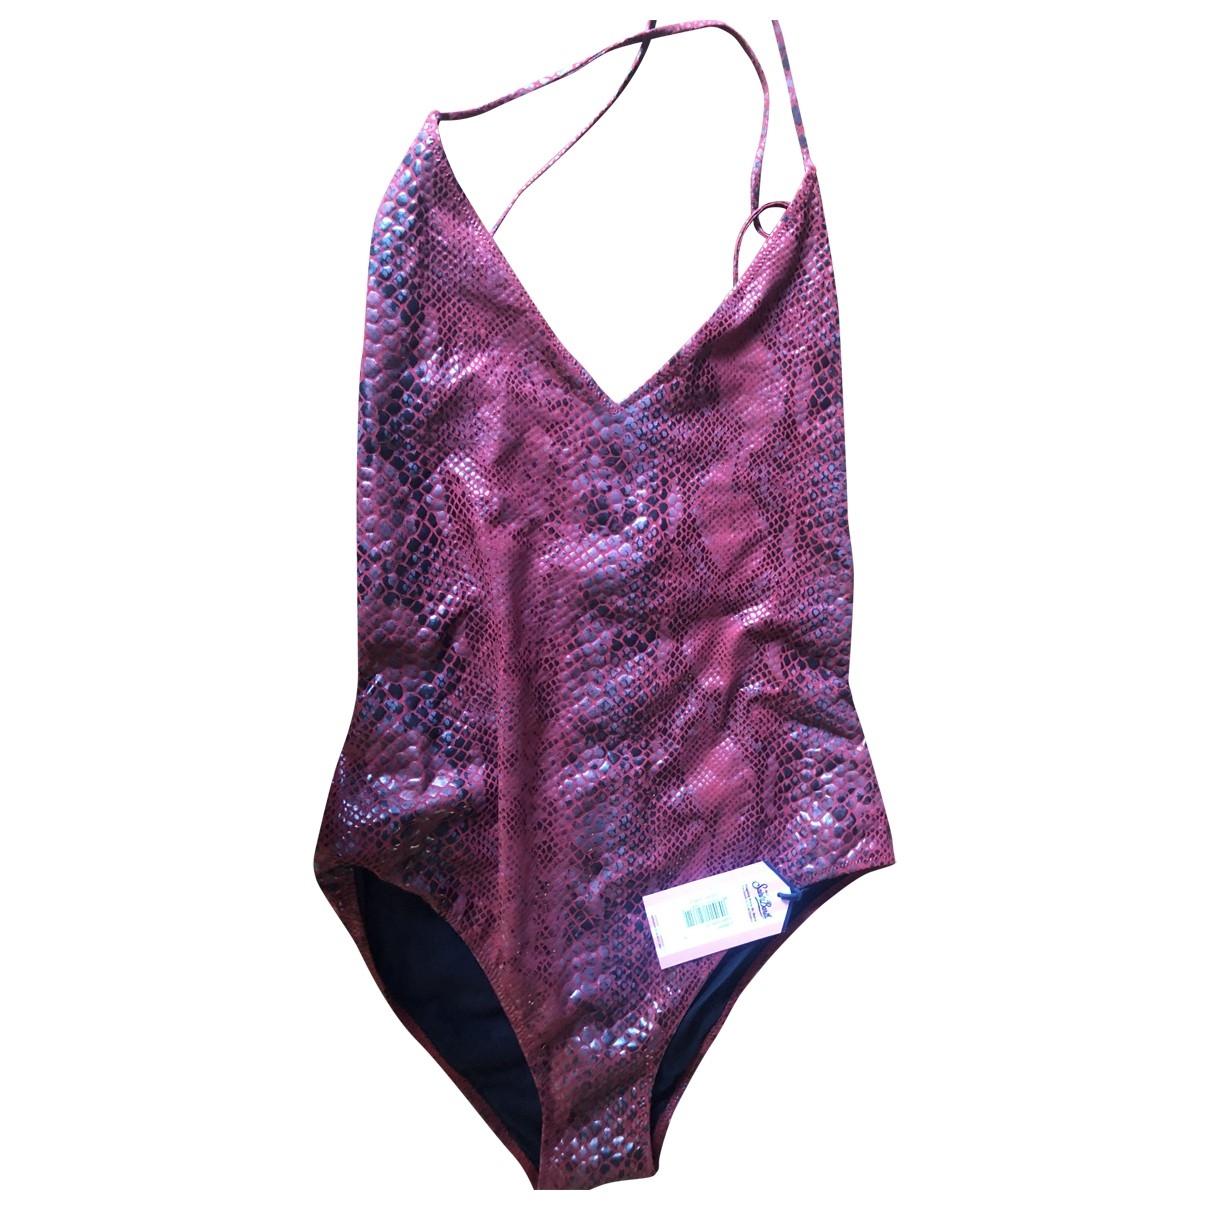 Mc2 Saint Barth \N Burgundy Lycra Swimwear for Women 38 - 40 IT